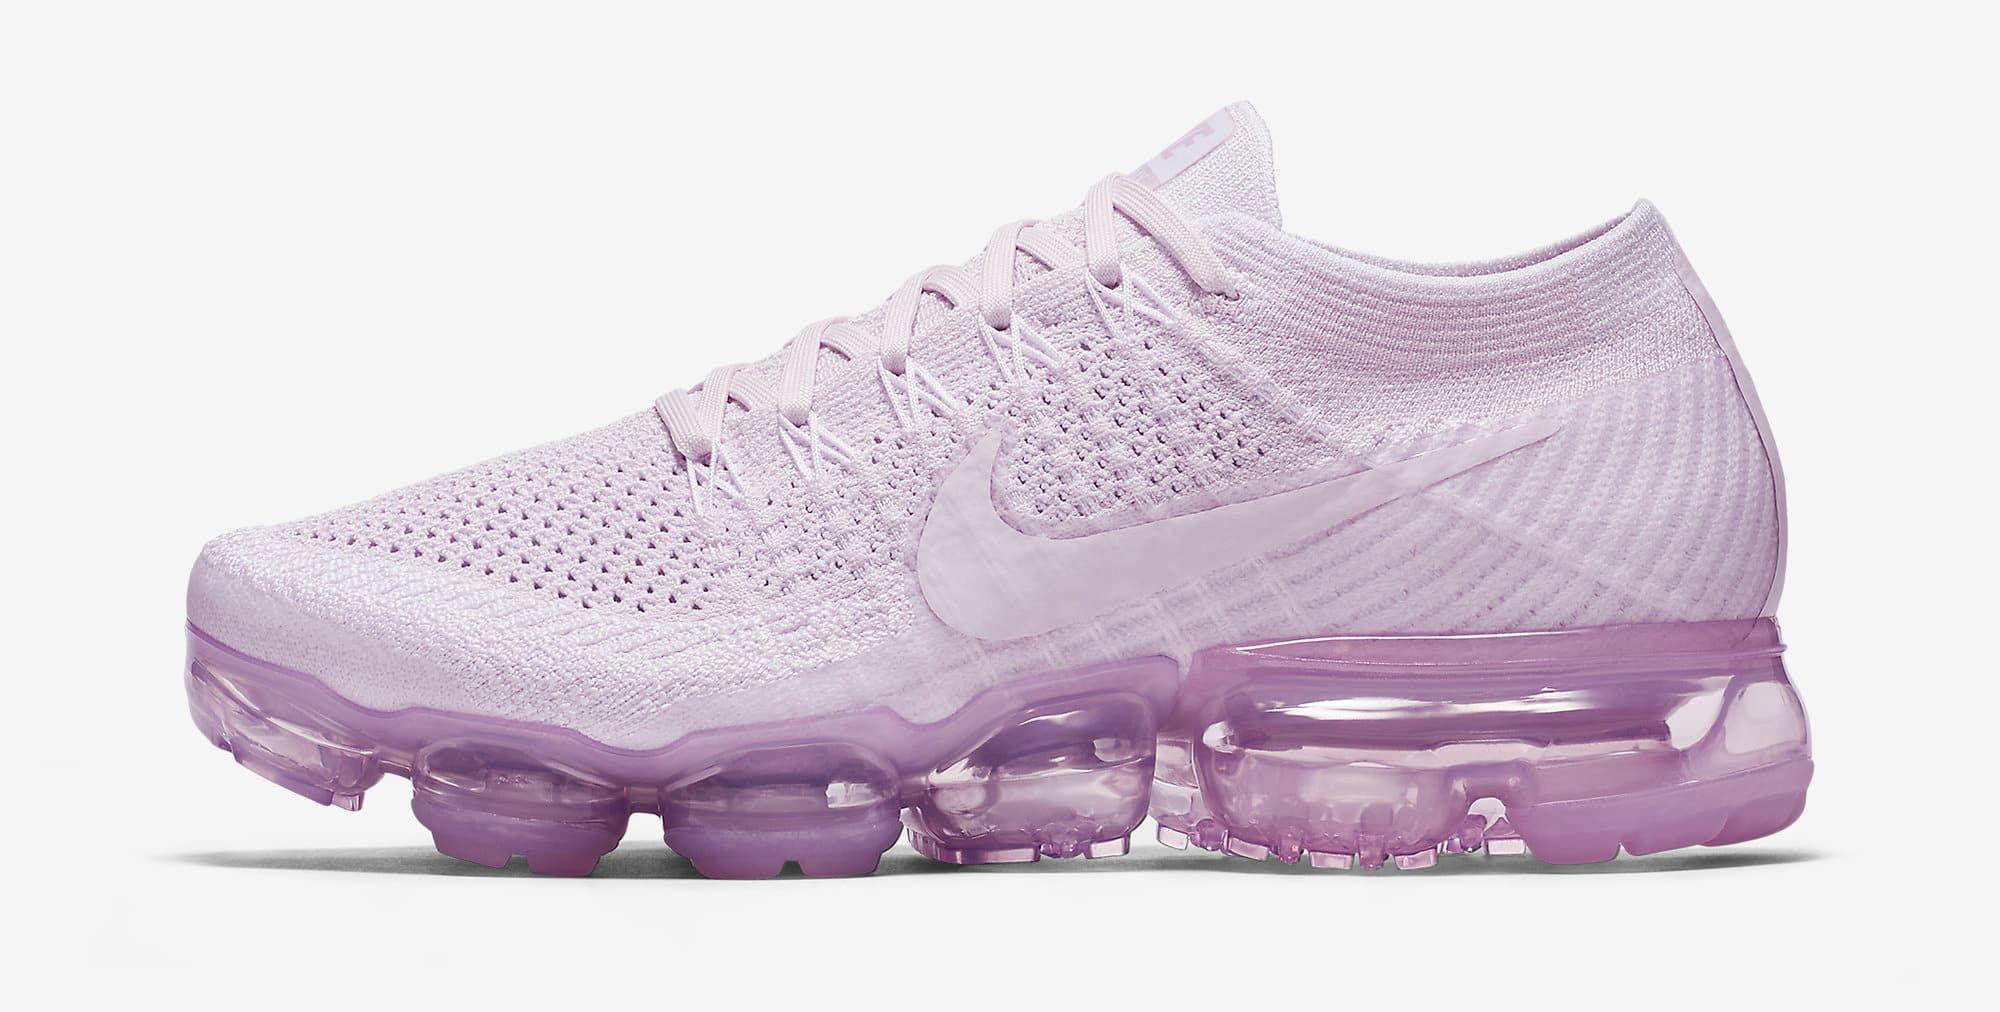 a87ec5325ada80 Light Violet Nike VaporMax 849557-501 Profile